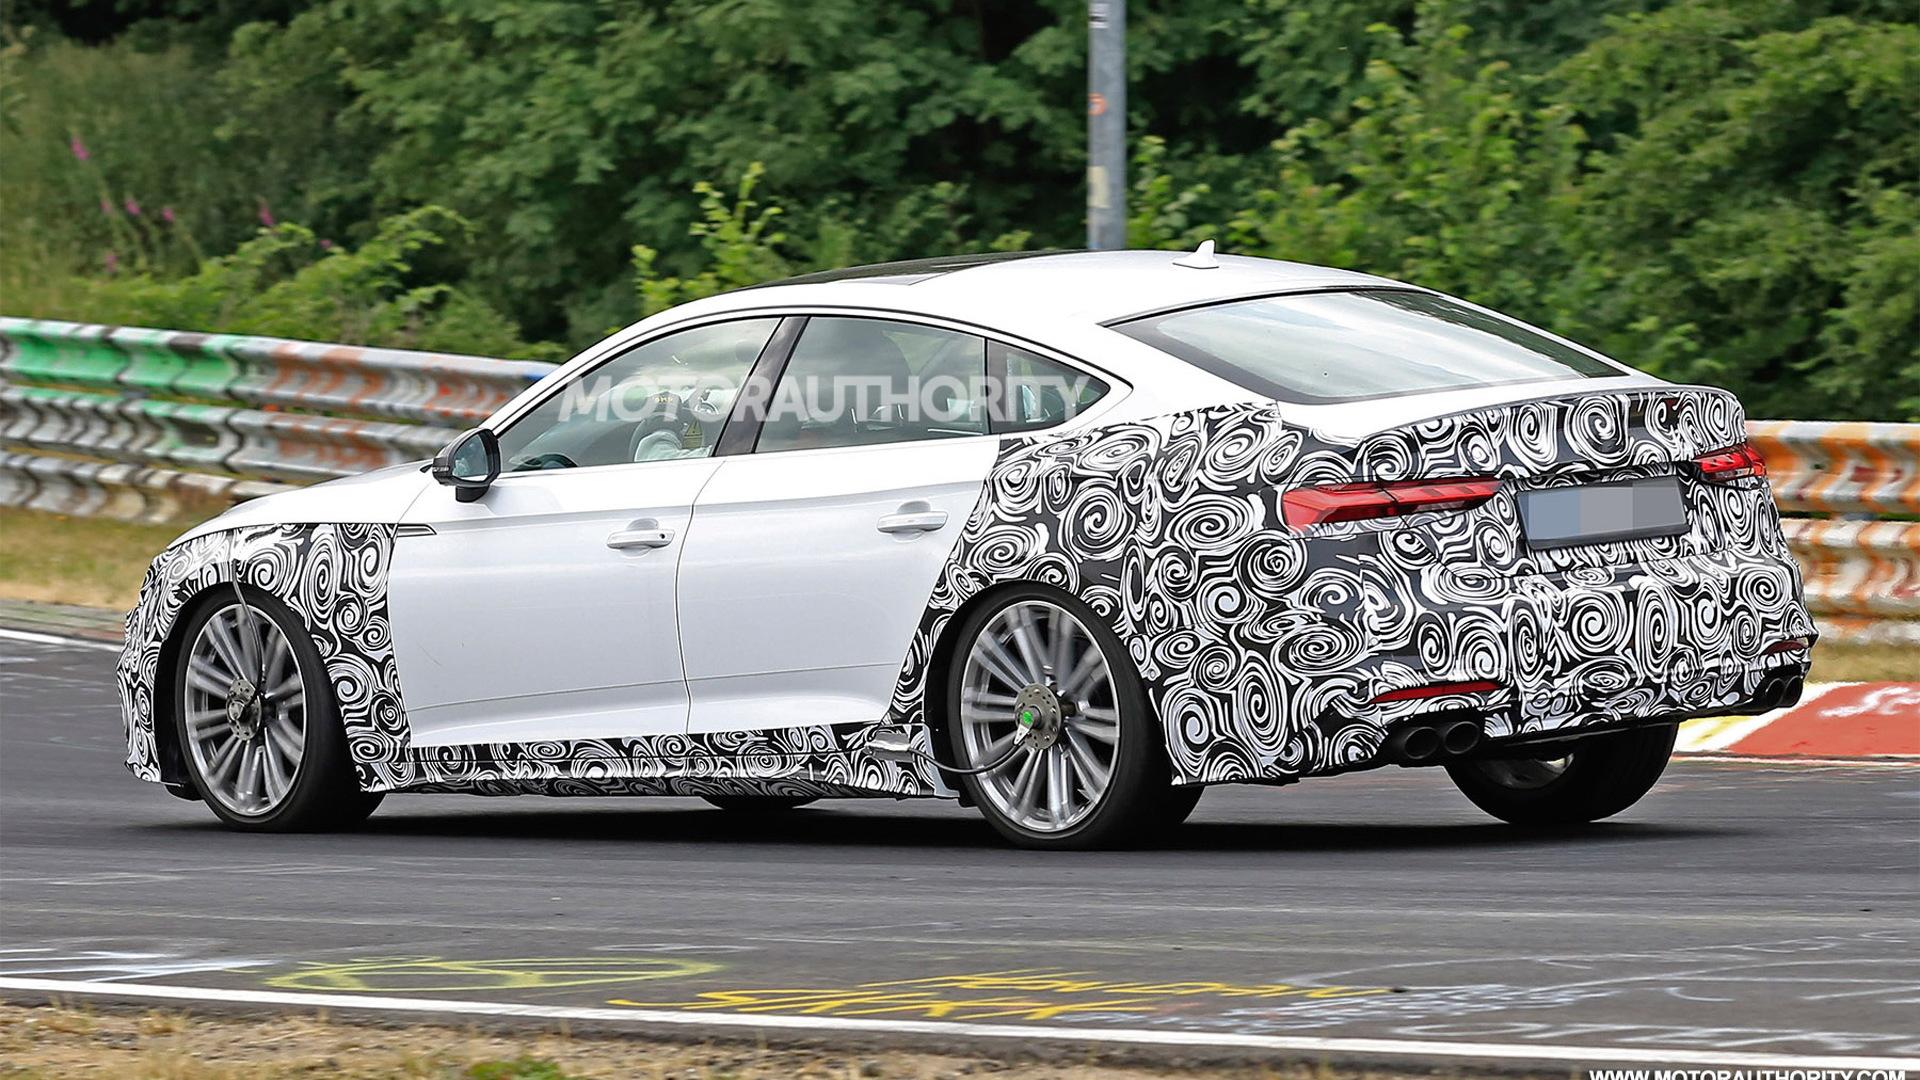 2021 Audi S5 Sportback facelift spy shots - Image via S. Baldauf/SB-Medien